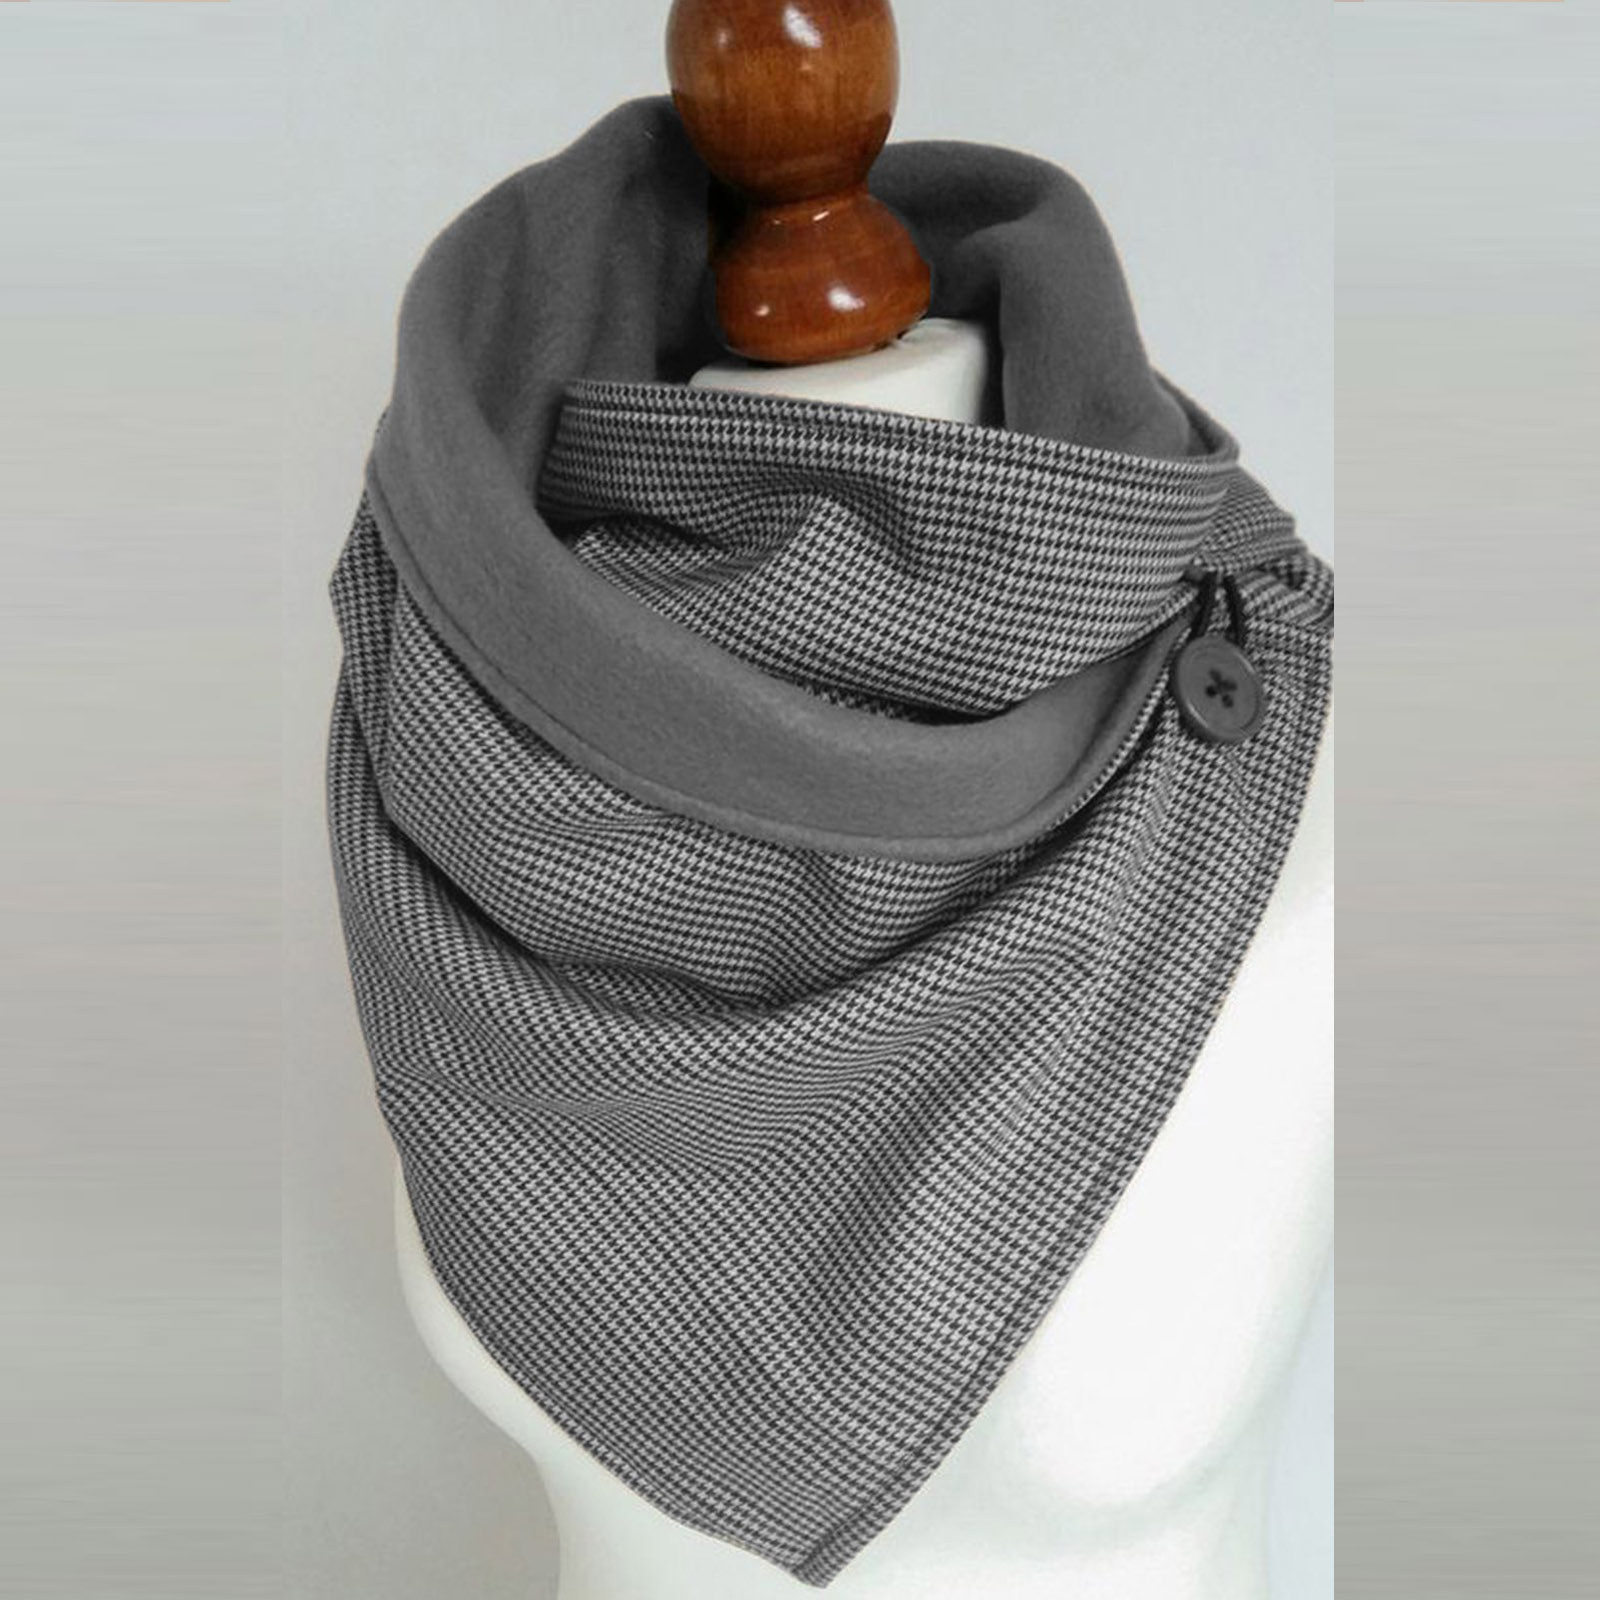 Women Scarf Winter Fashion Stitching PlaiPrint Button Soft Wrap 2020 Casual Warm Scarves Shawls Scarf Women шарф женский